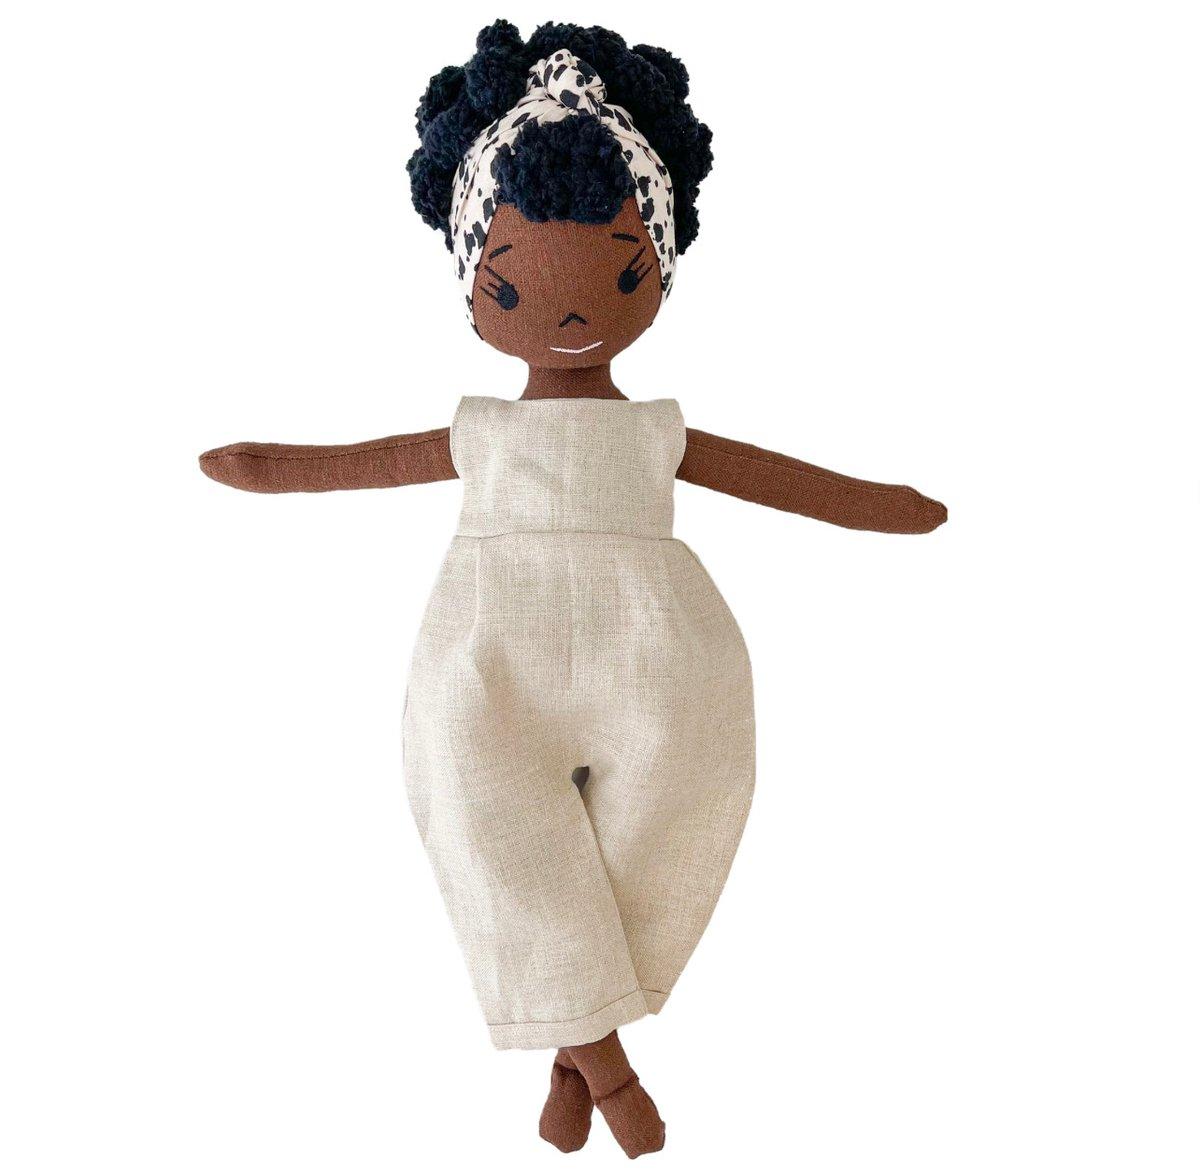 Danika Handmade Linen Doll (Waitlist Preorder Item - ship date Oct 1-Mar 30,2022)